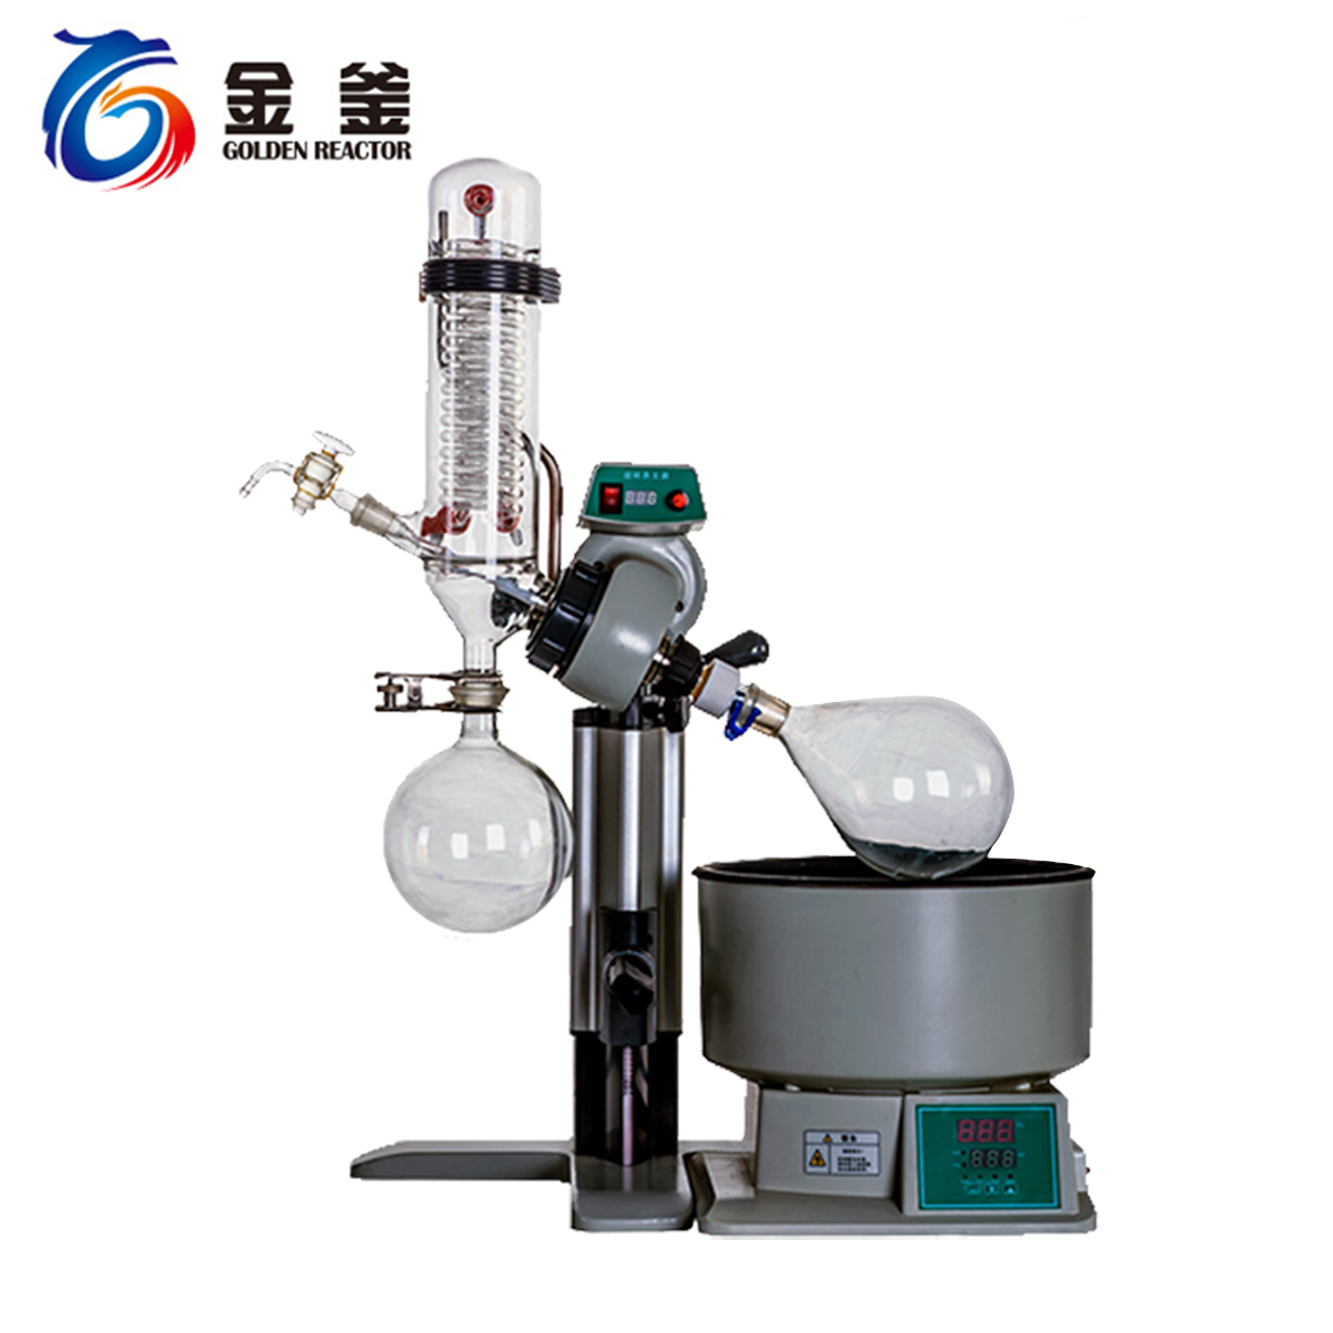 RE-2010 0.5-2L仿進口旋轉蒸發器